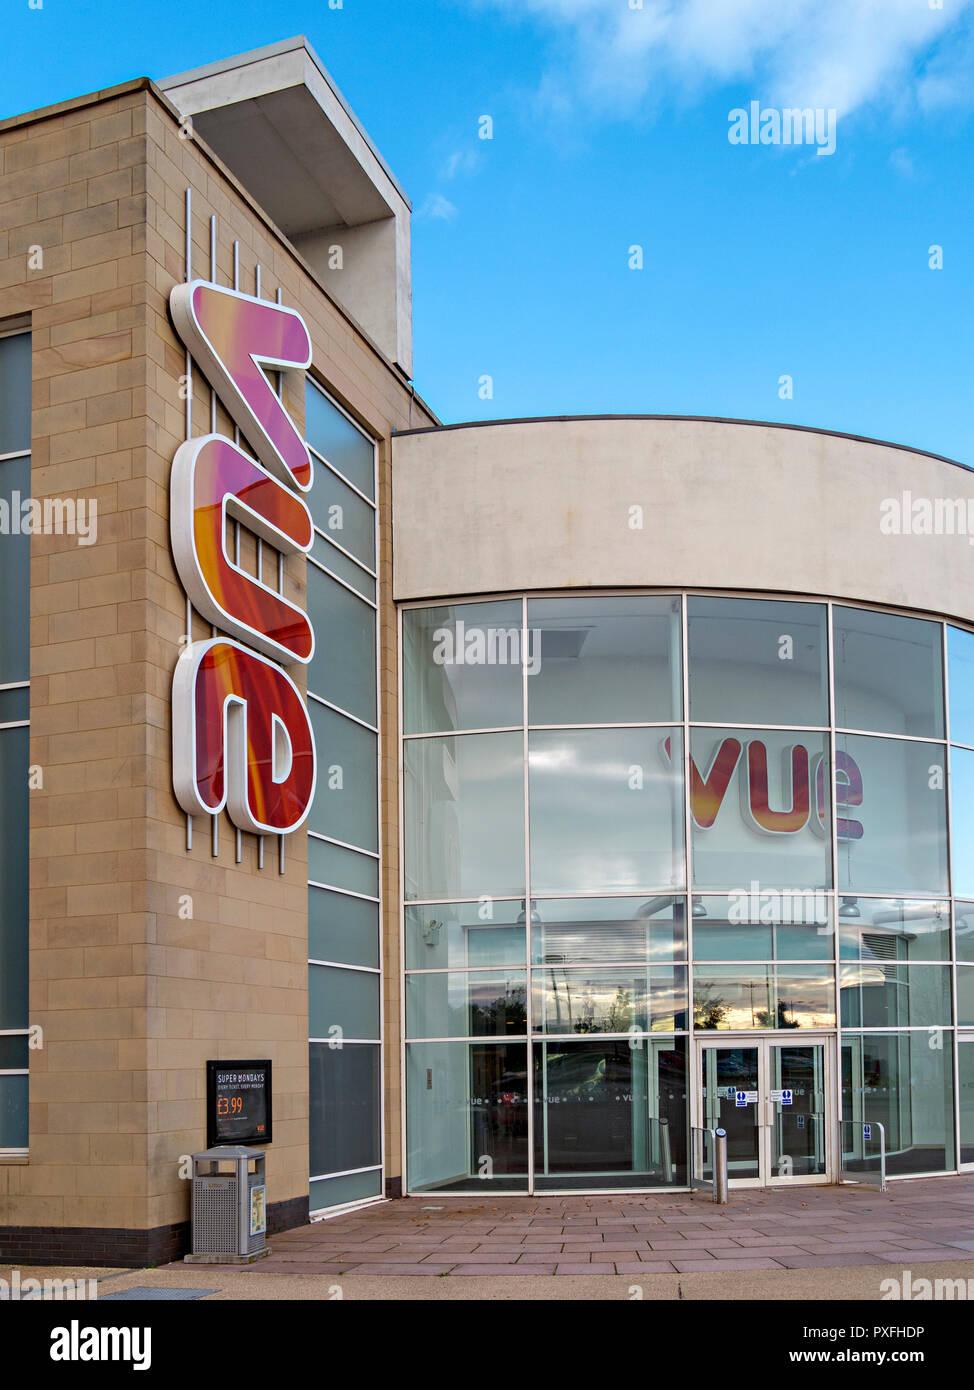 Exterior of modern Vue multiplex cinema showing colourful Vue logo and entrance lobby, Forthside, Stirling, Scotland, UK - Stock Image